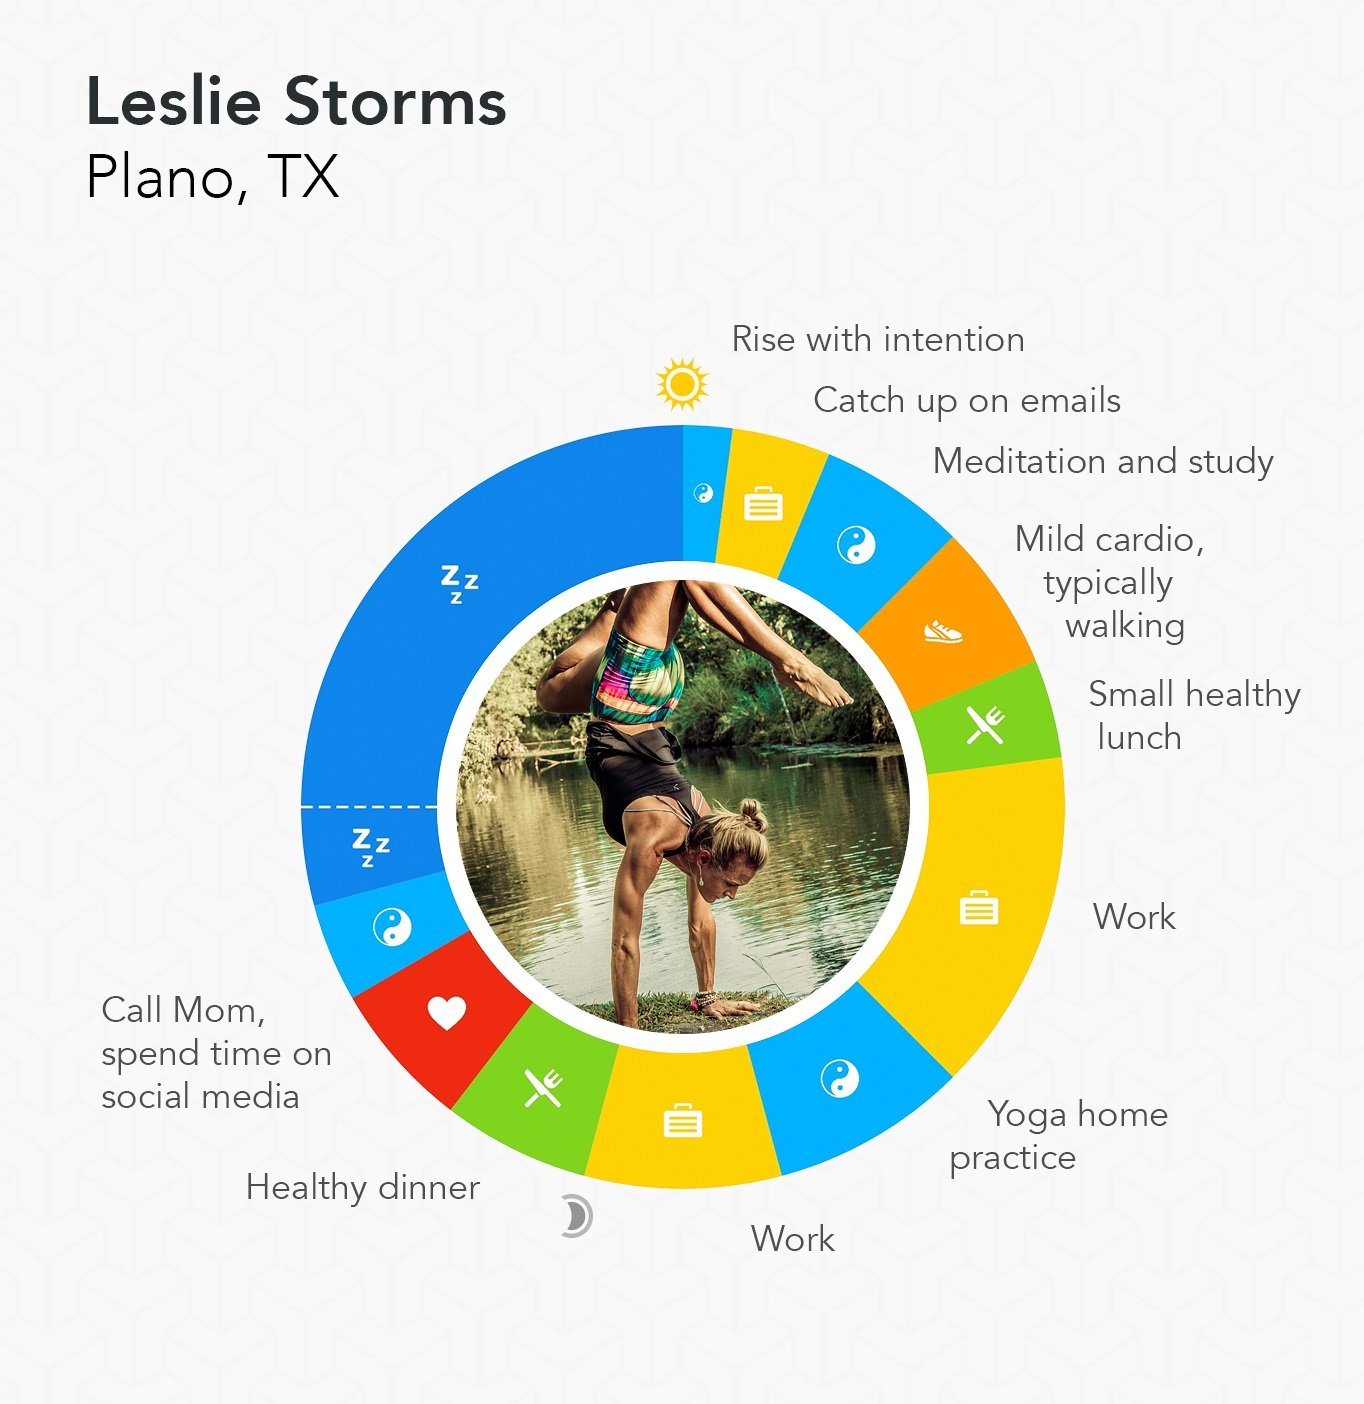 ls-1 Daily Rhythms: Yoga Instructors Infographic Uncategorized Yoga Instructor